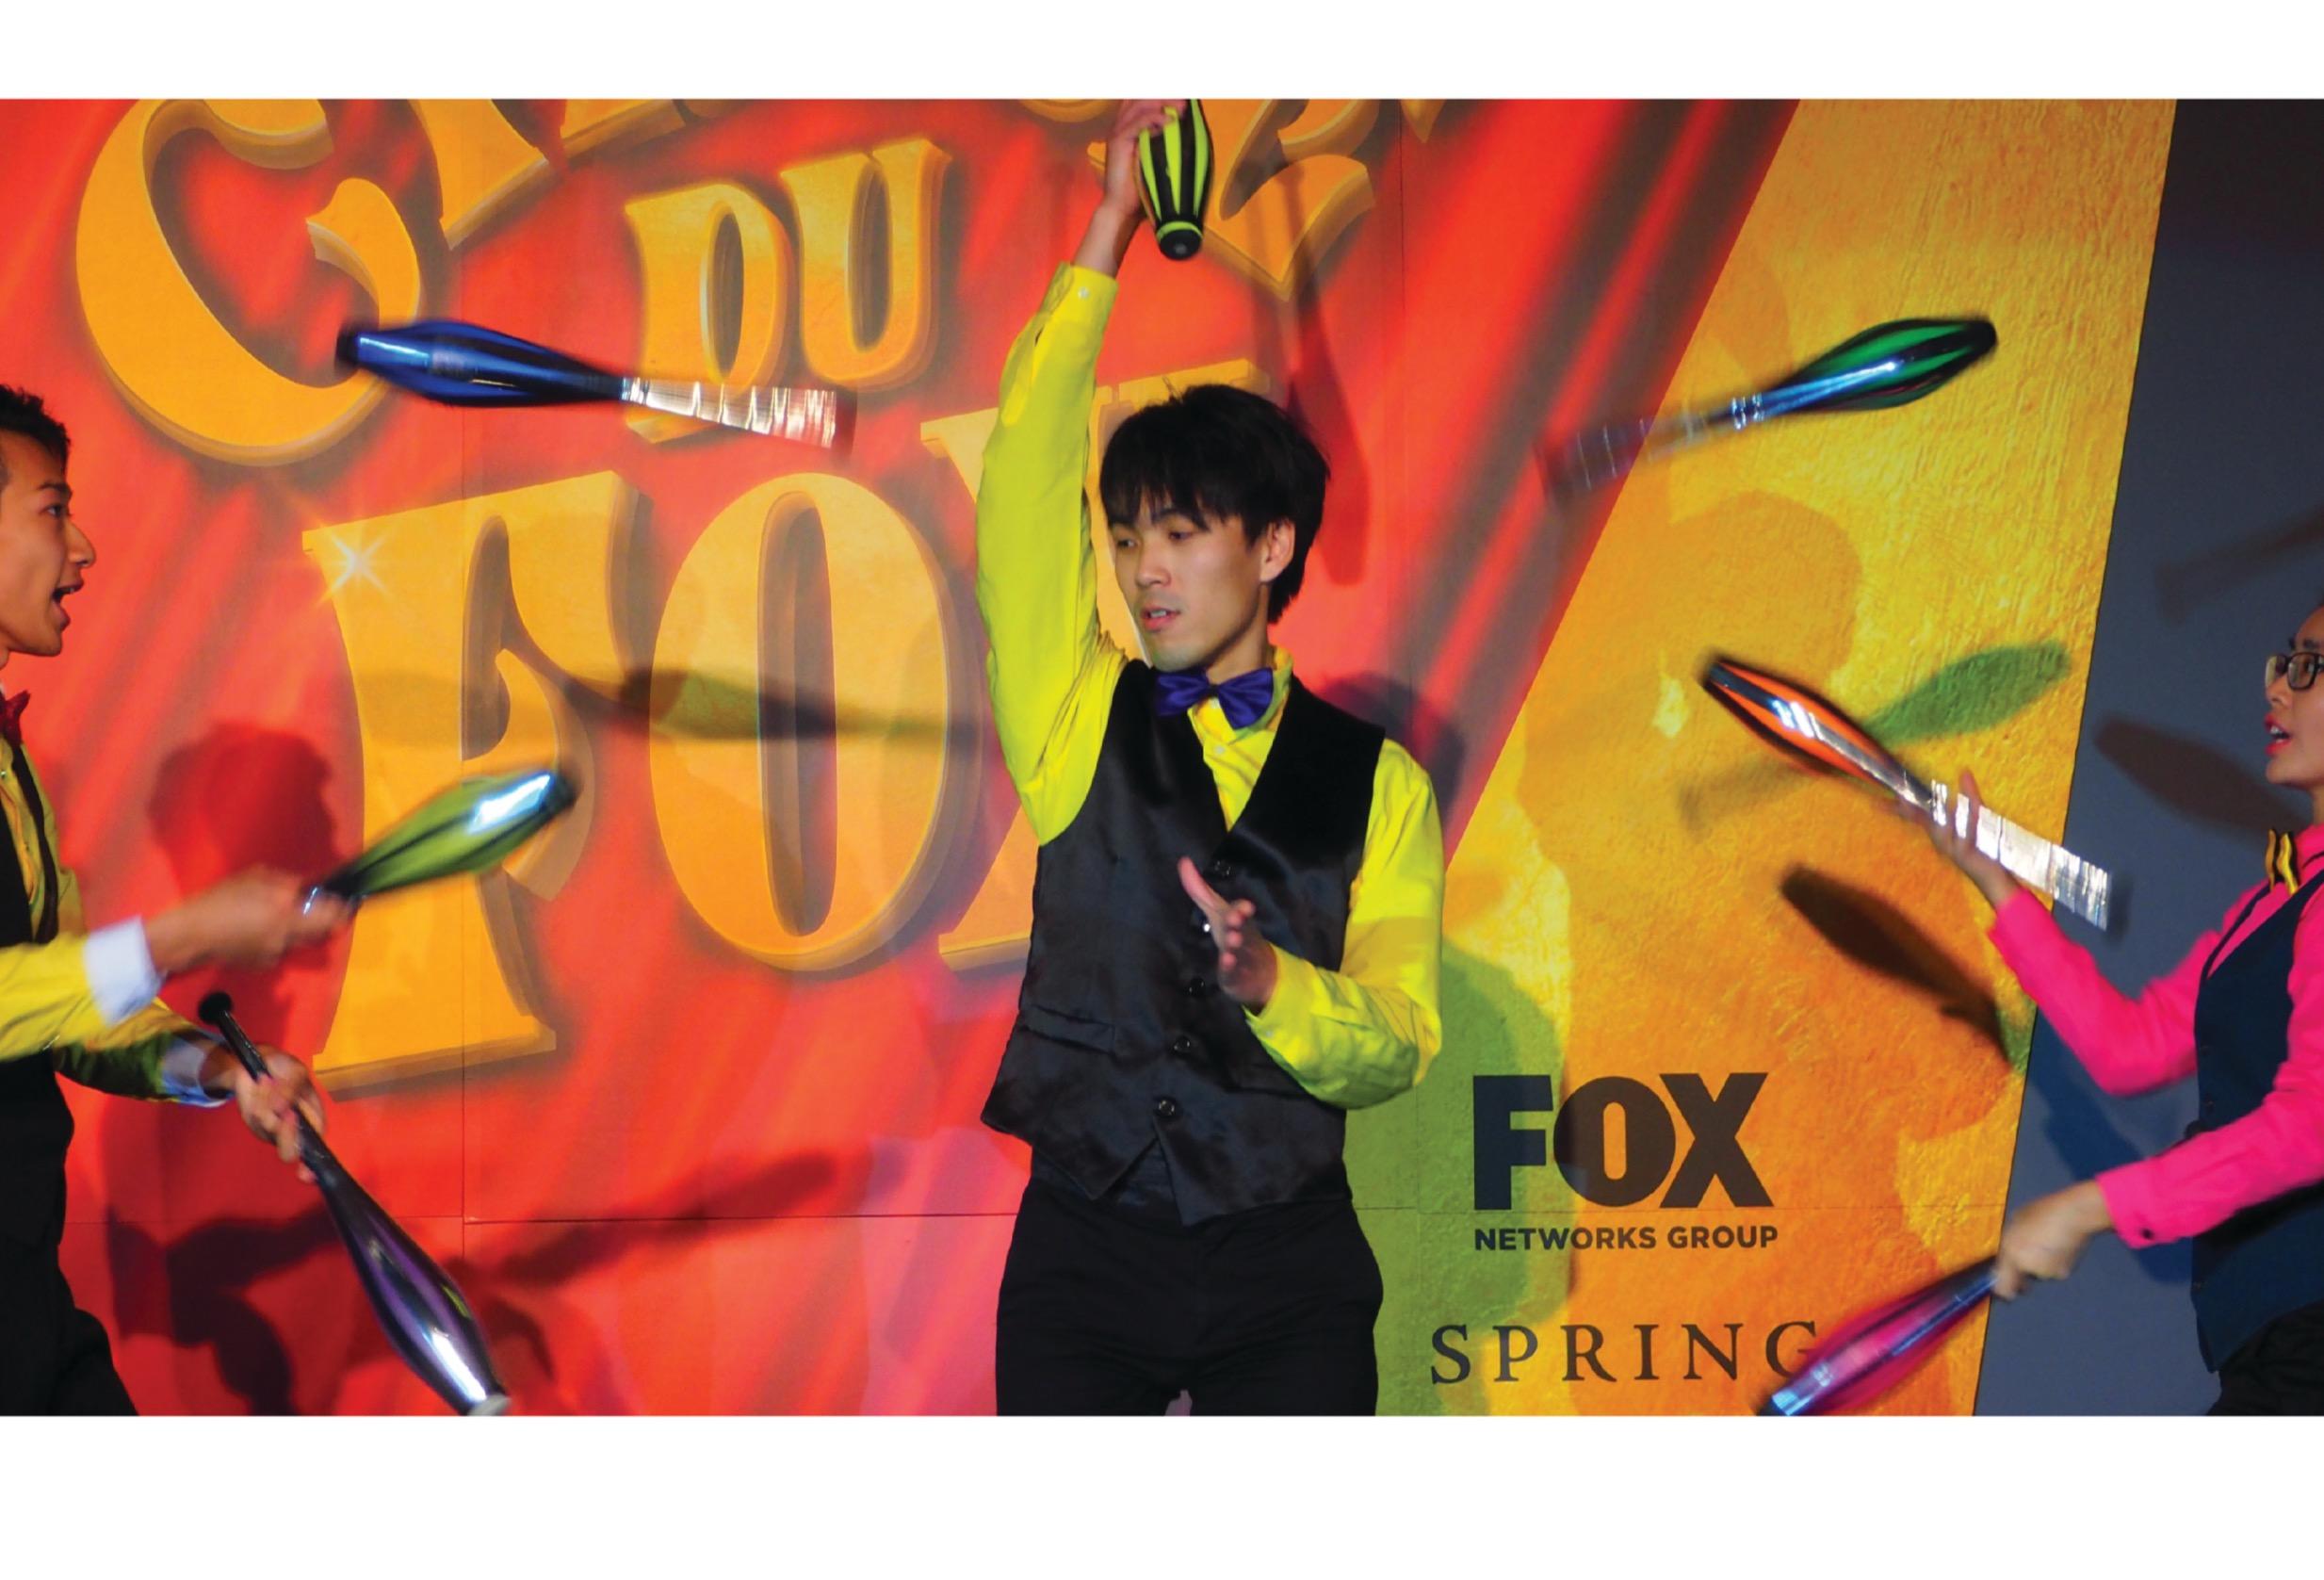 Juggling Show @CIRCUE DU FOX